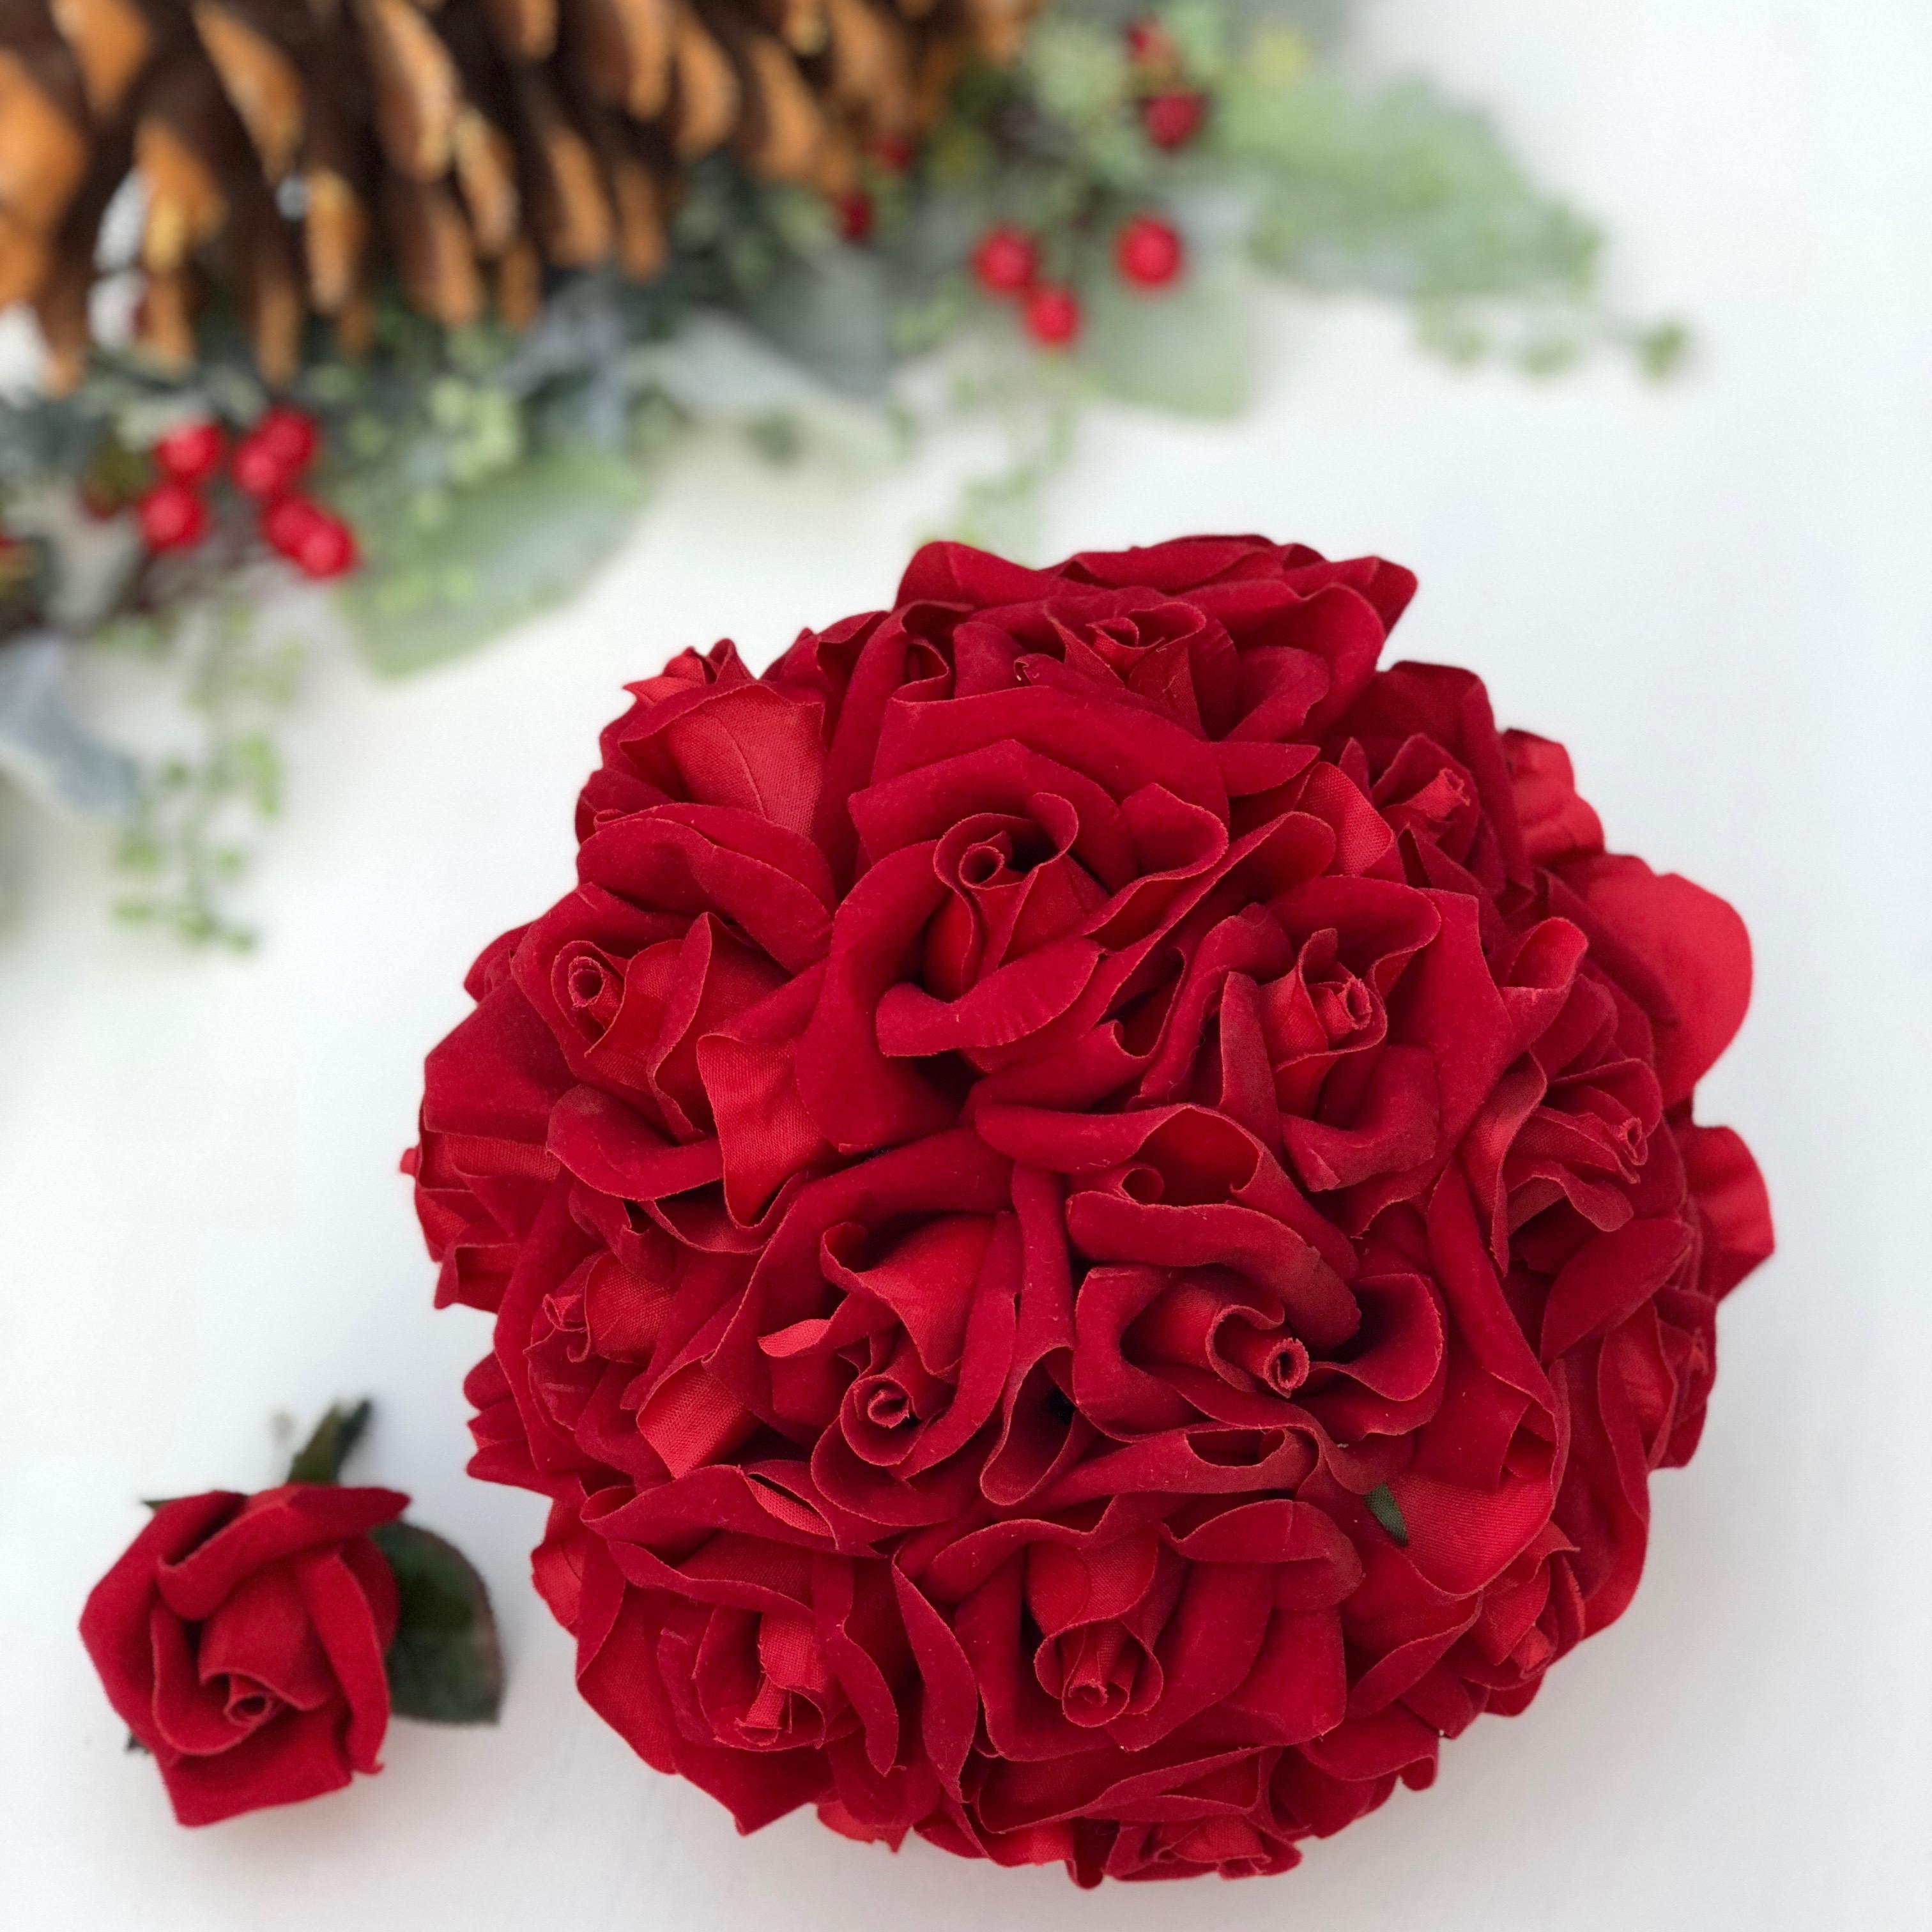 24 Red Velvet rose silk wedding flower bouquet